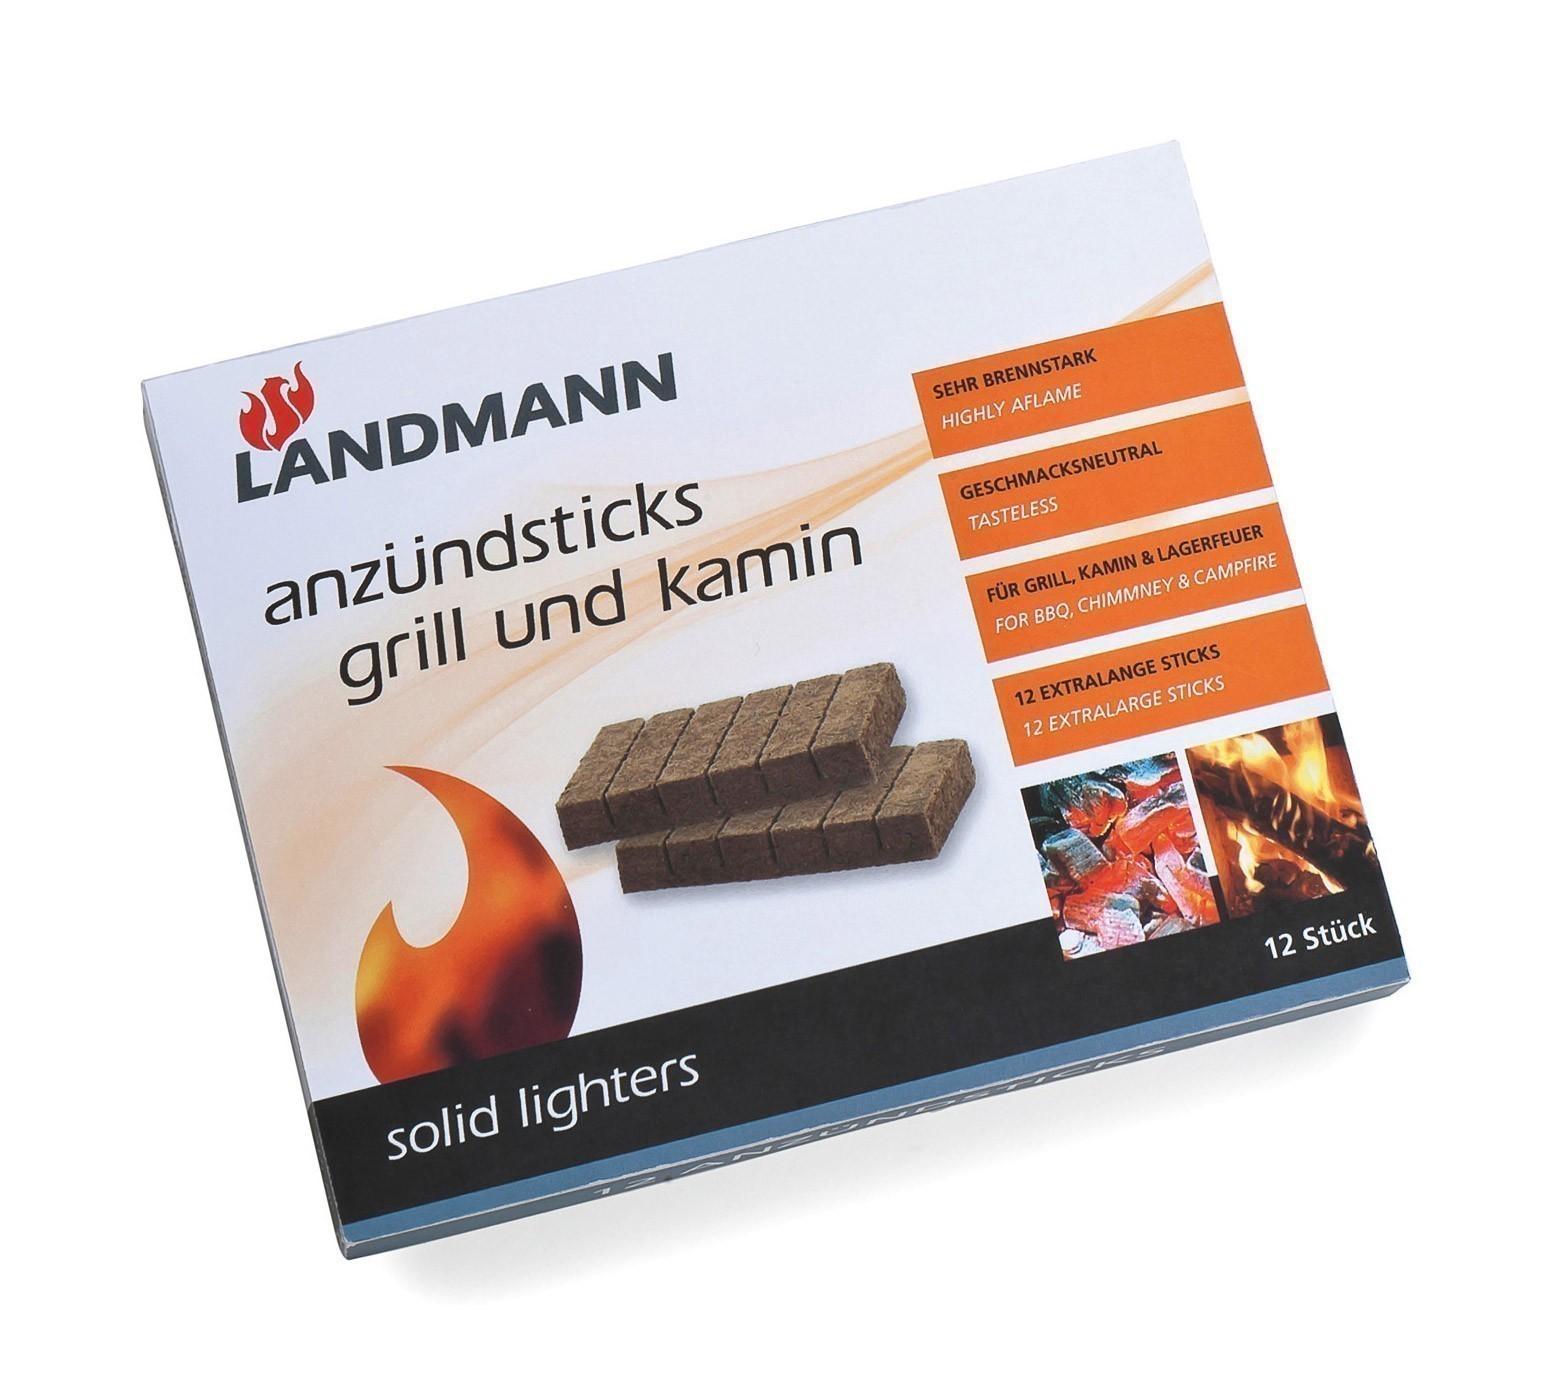 landmann grillanz nder 12 anz ndriegel 0140 bei. Black Bedroom Furniture Sets. Home Design Ideas